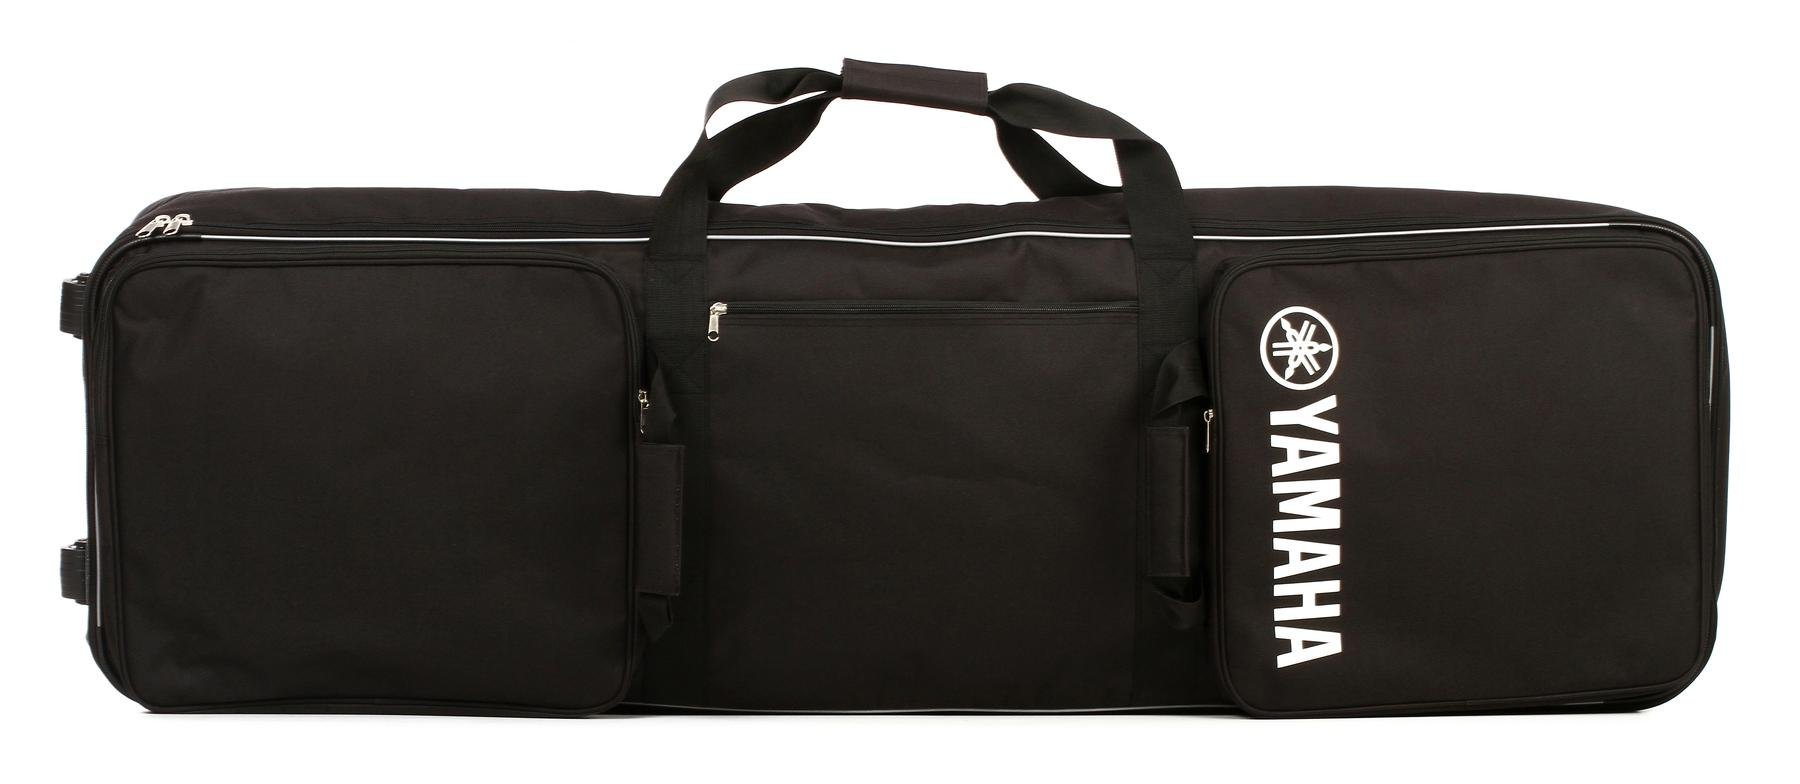 Yamaha Padded Bag with Wheels for MOXF8 and MX88